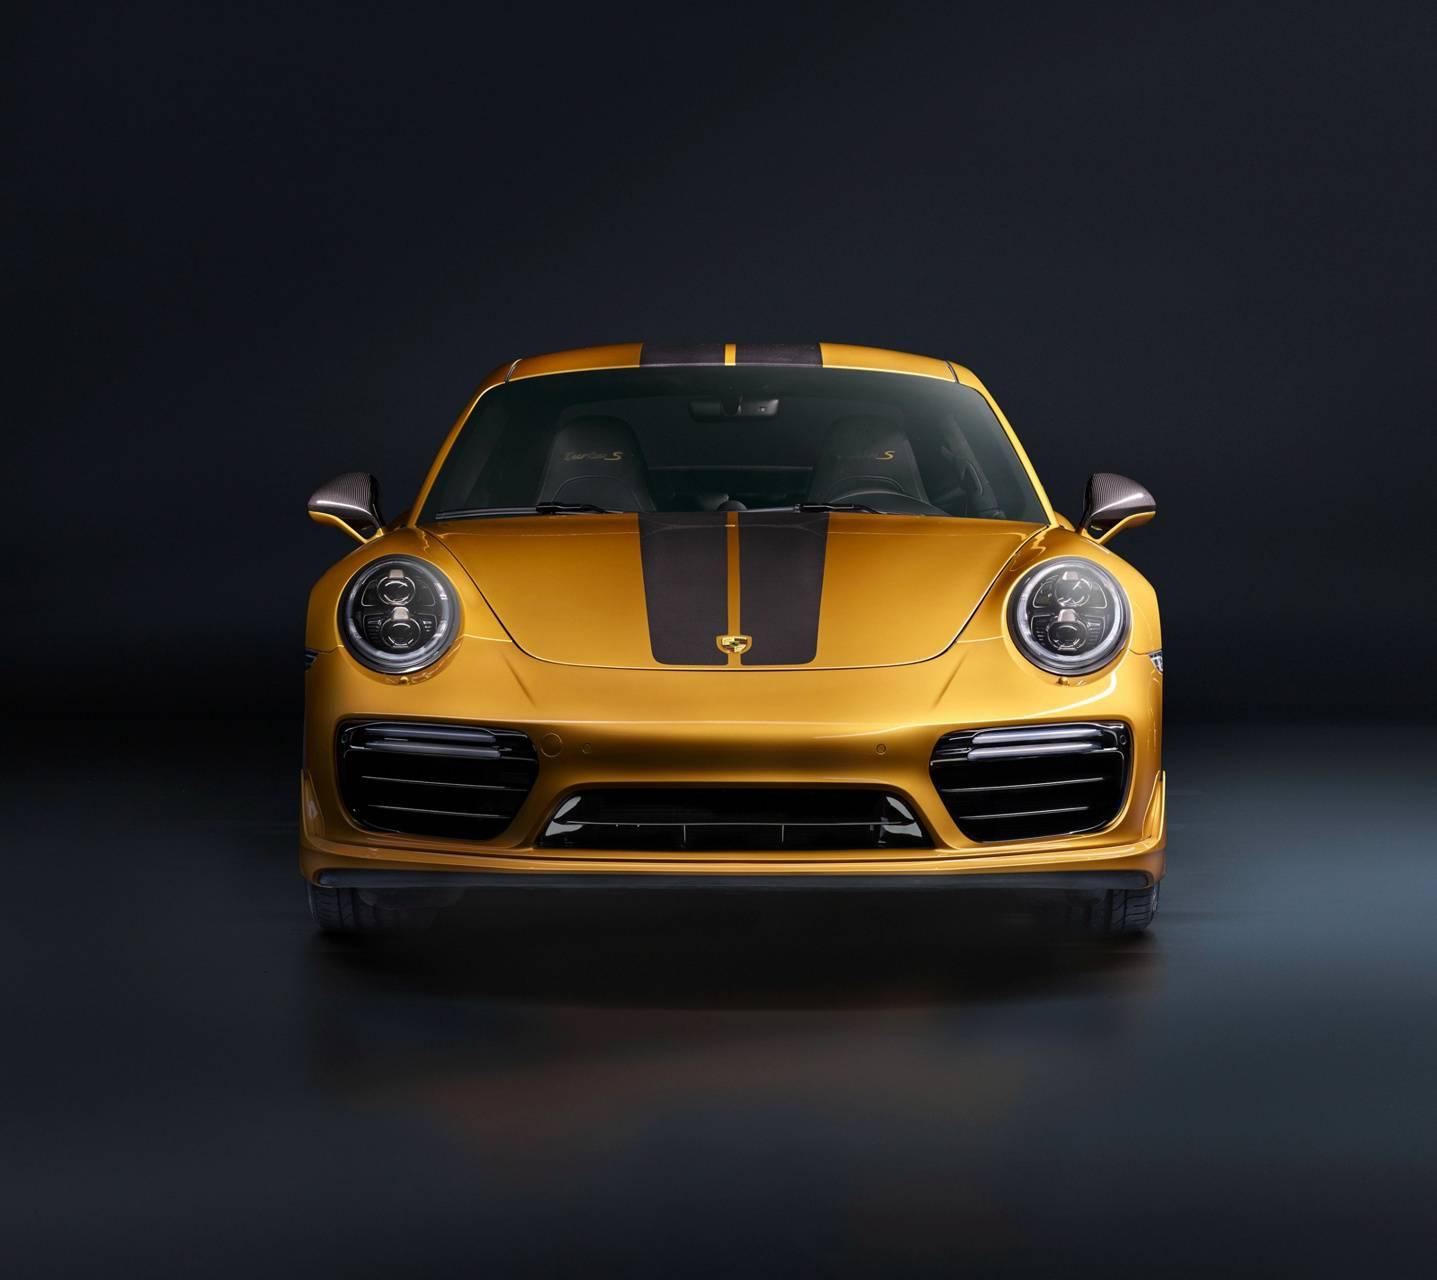 Porsche 911 Turbo S Wallpapers Free By Zedge